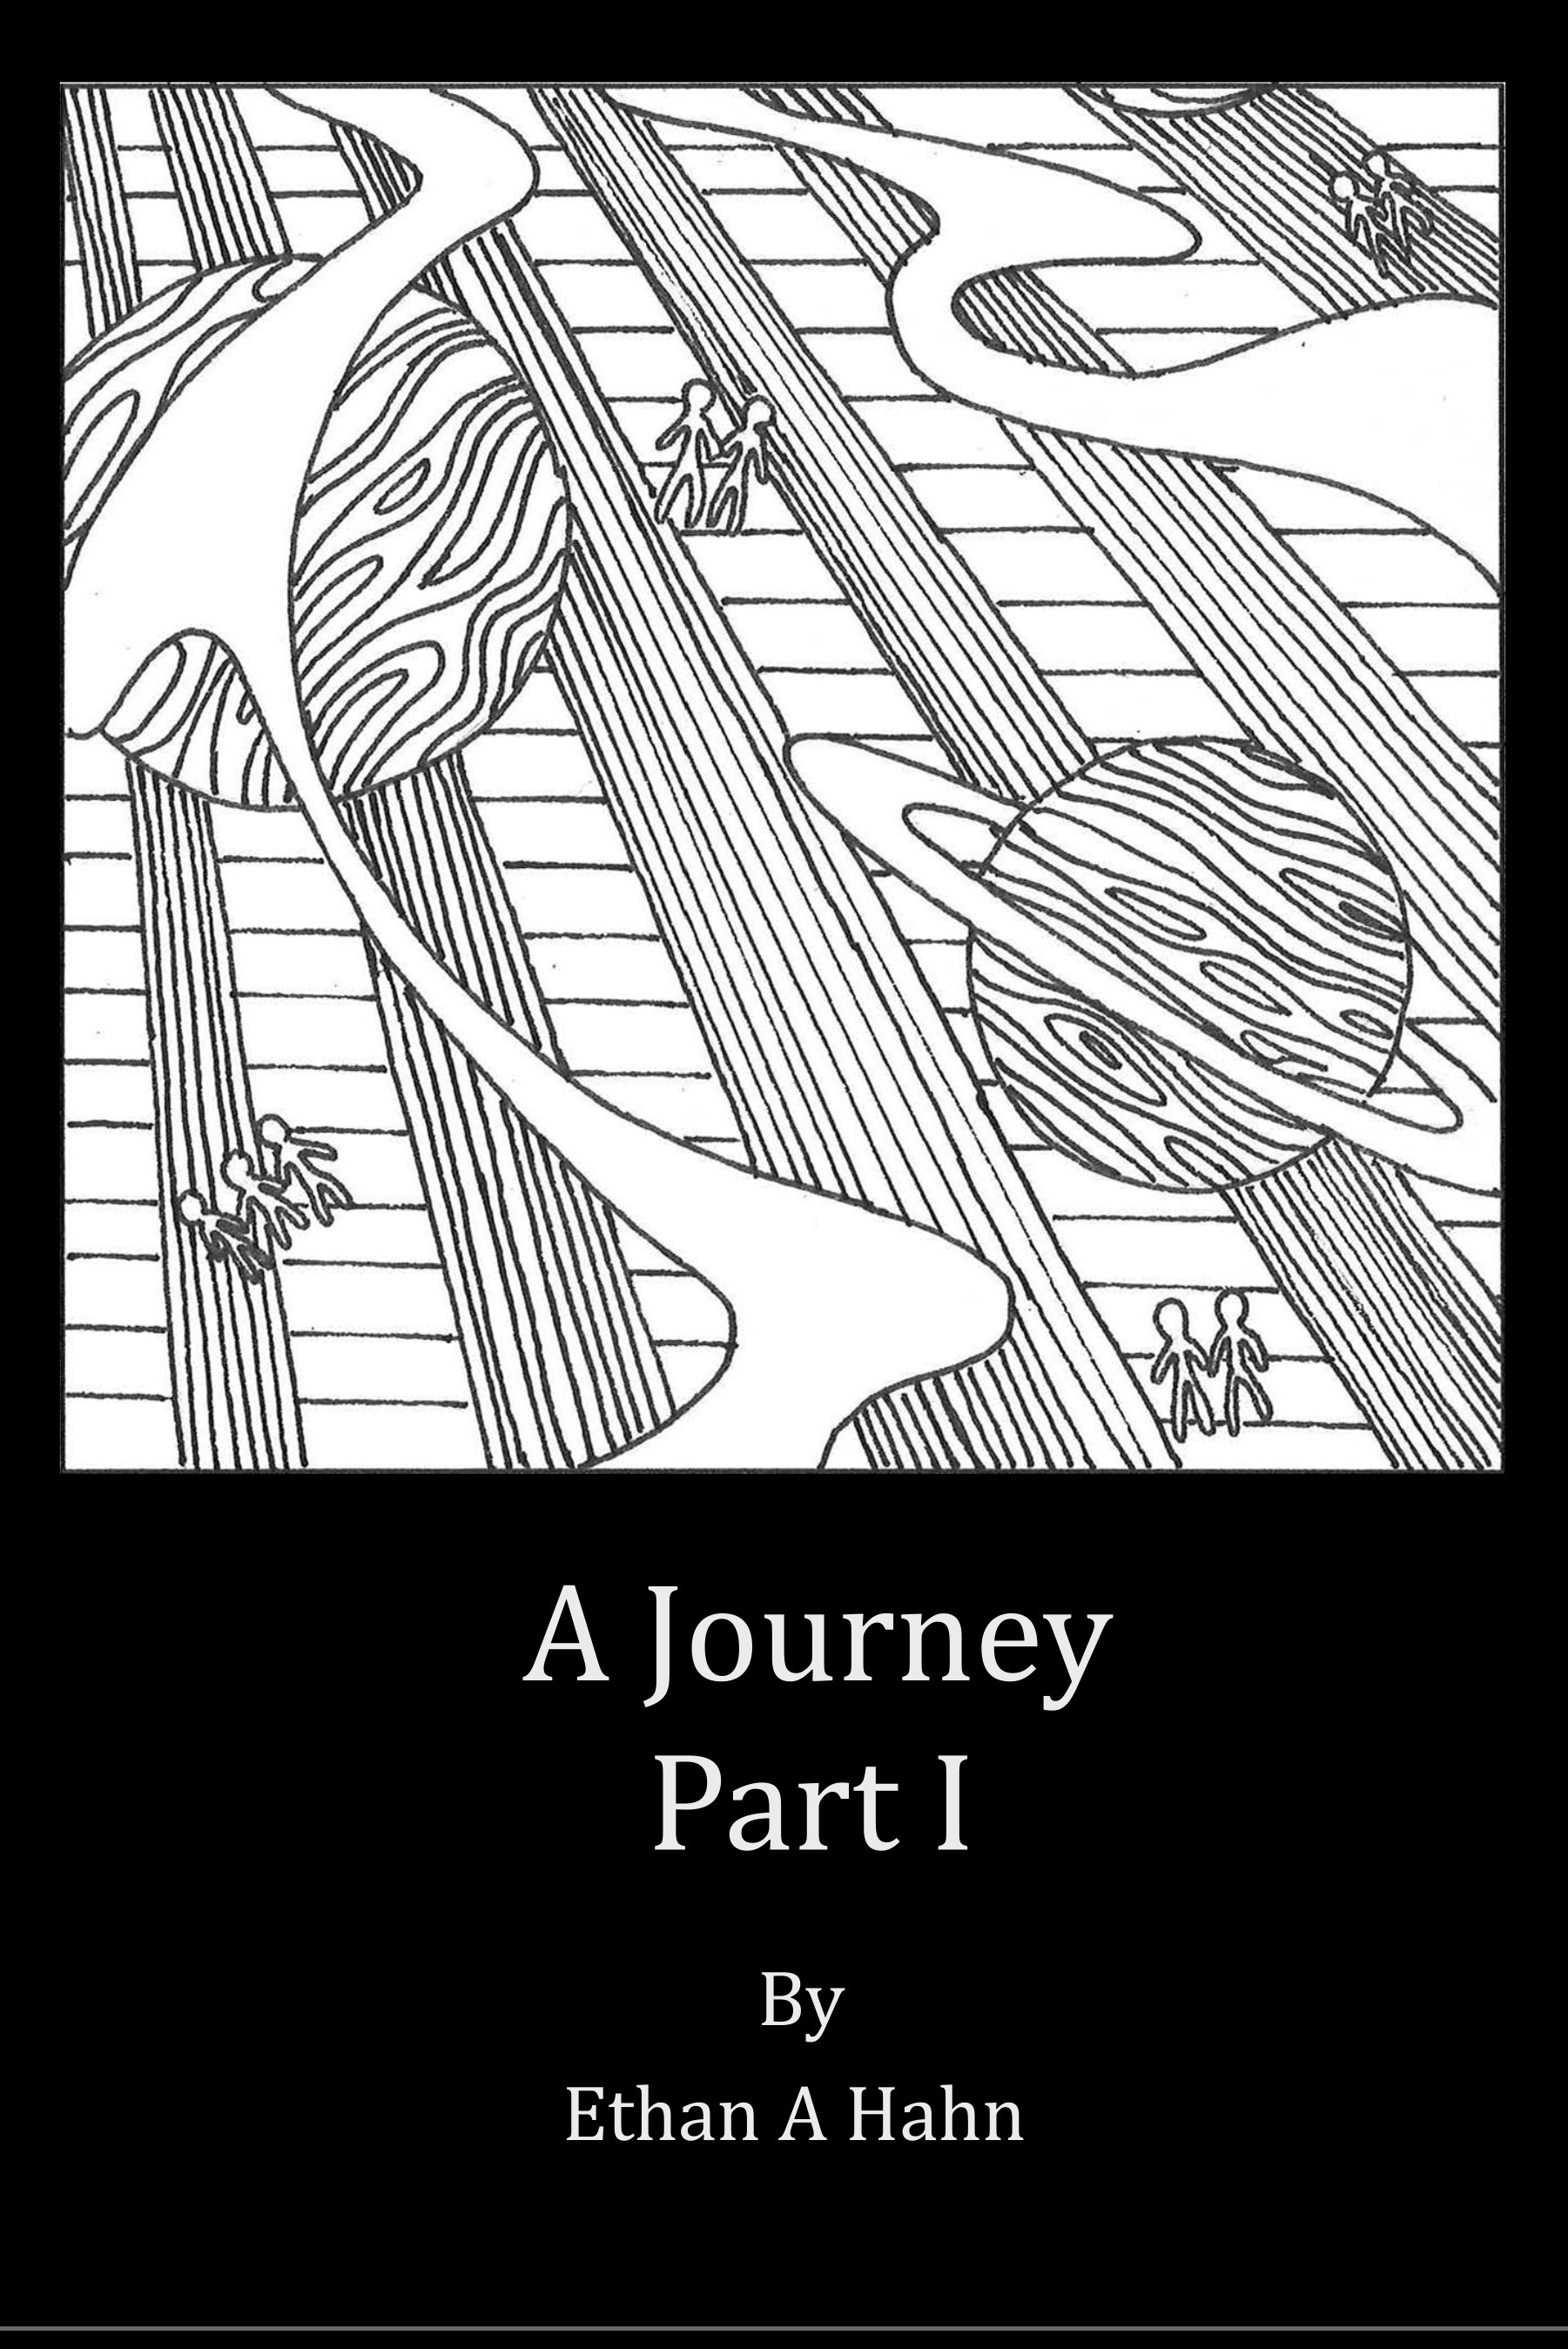 A Journey Part I